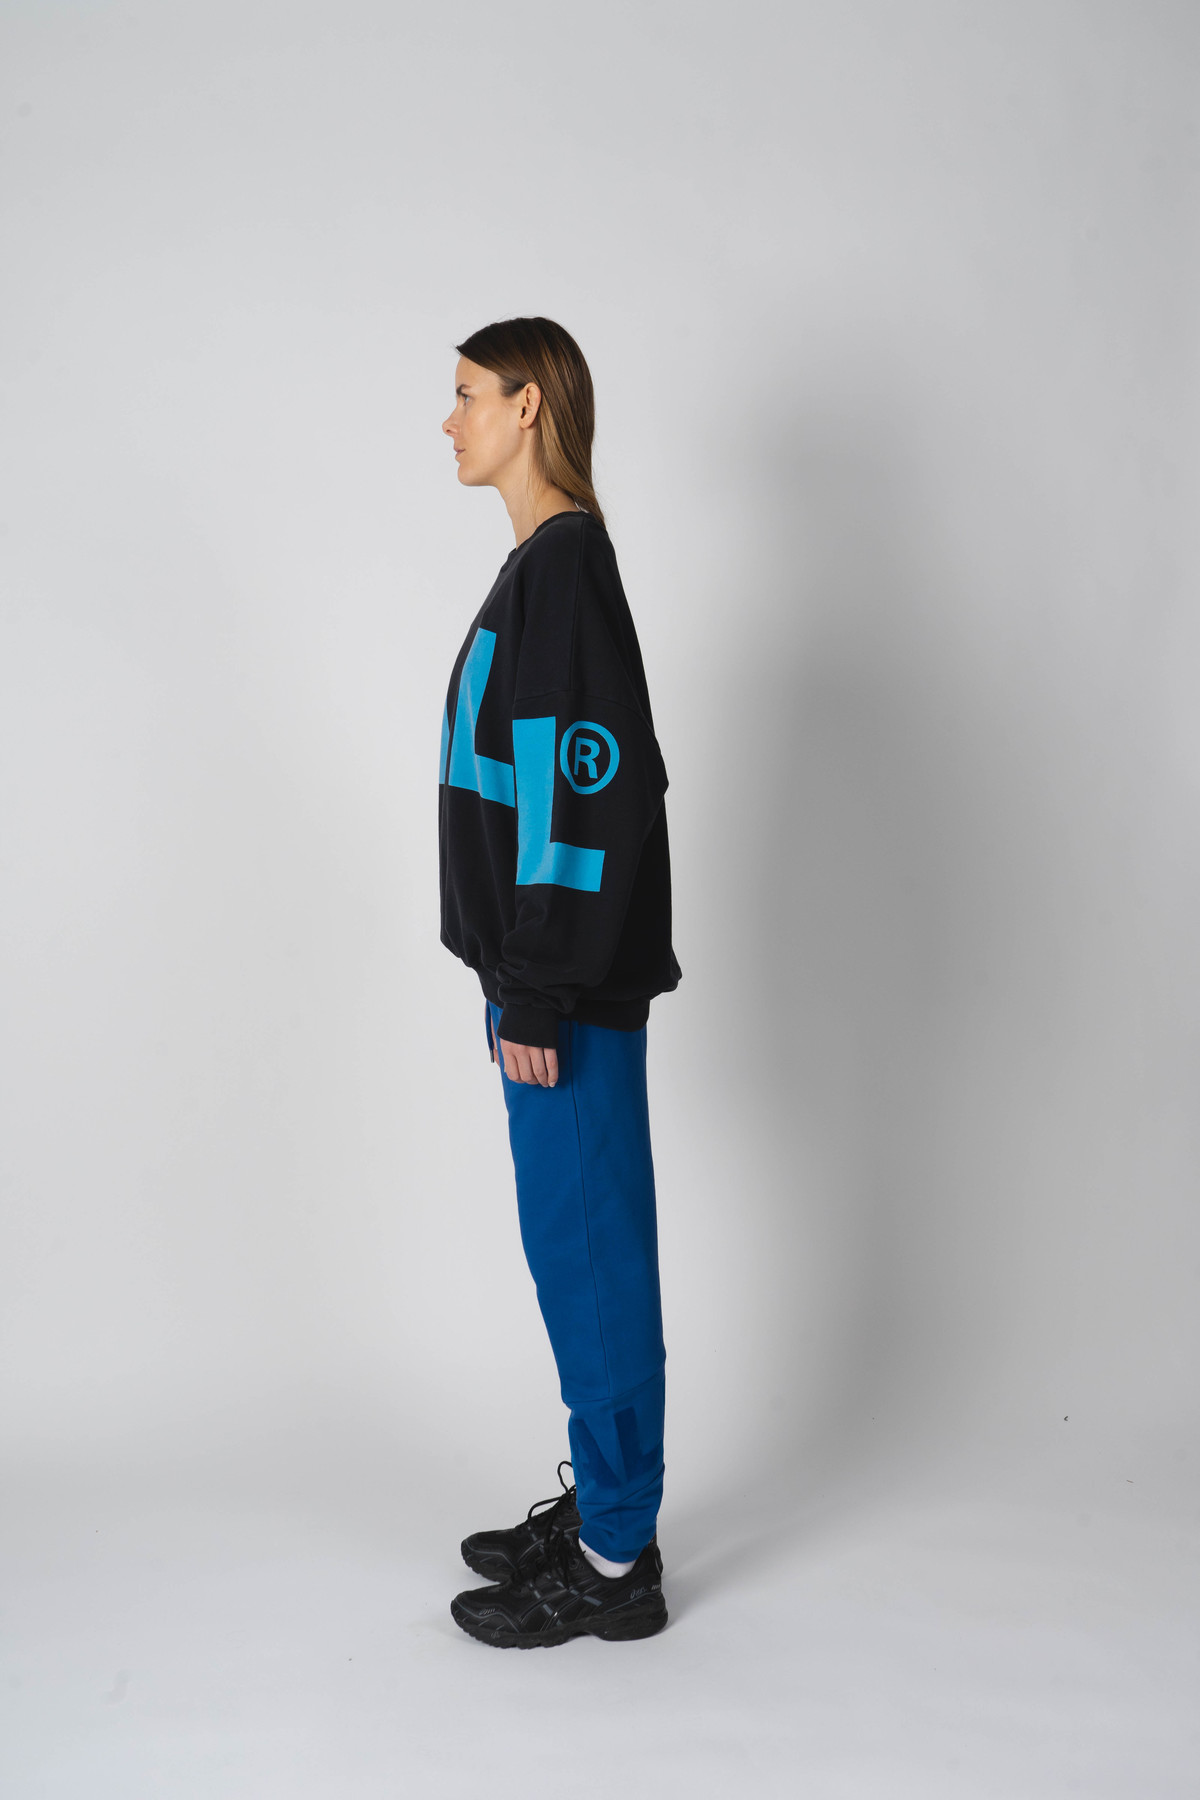 BALL Wham OG Crew Neck sweatshirt, sort, XS